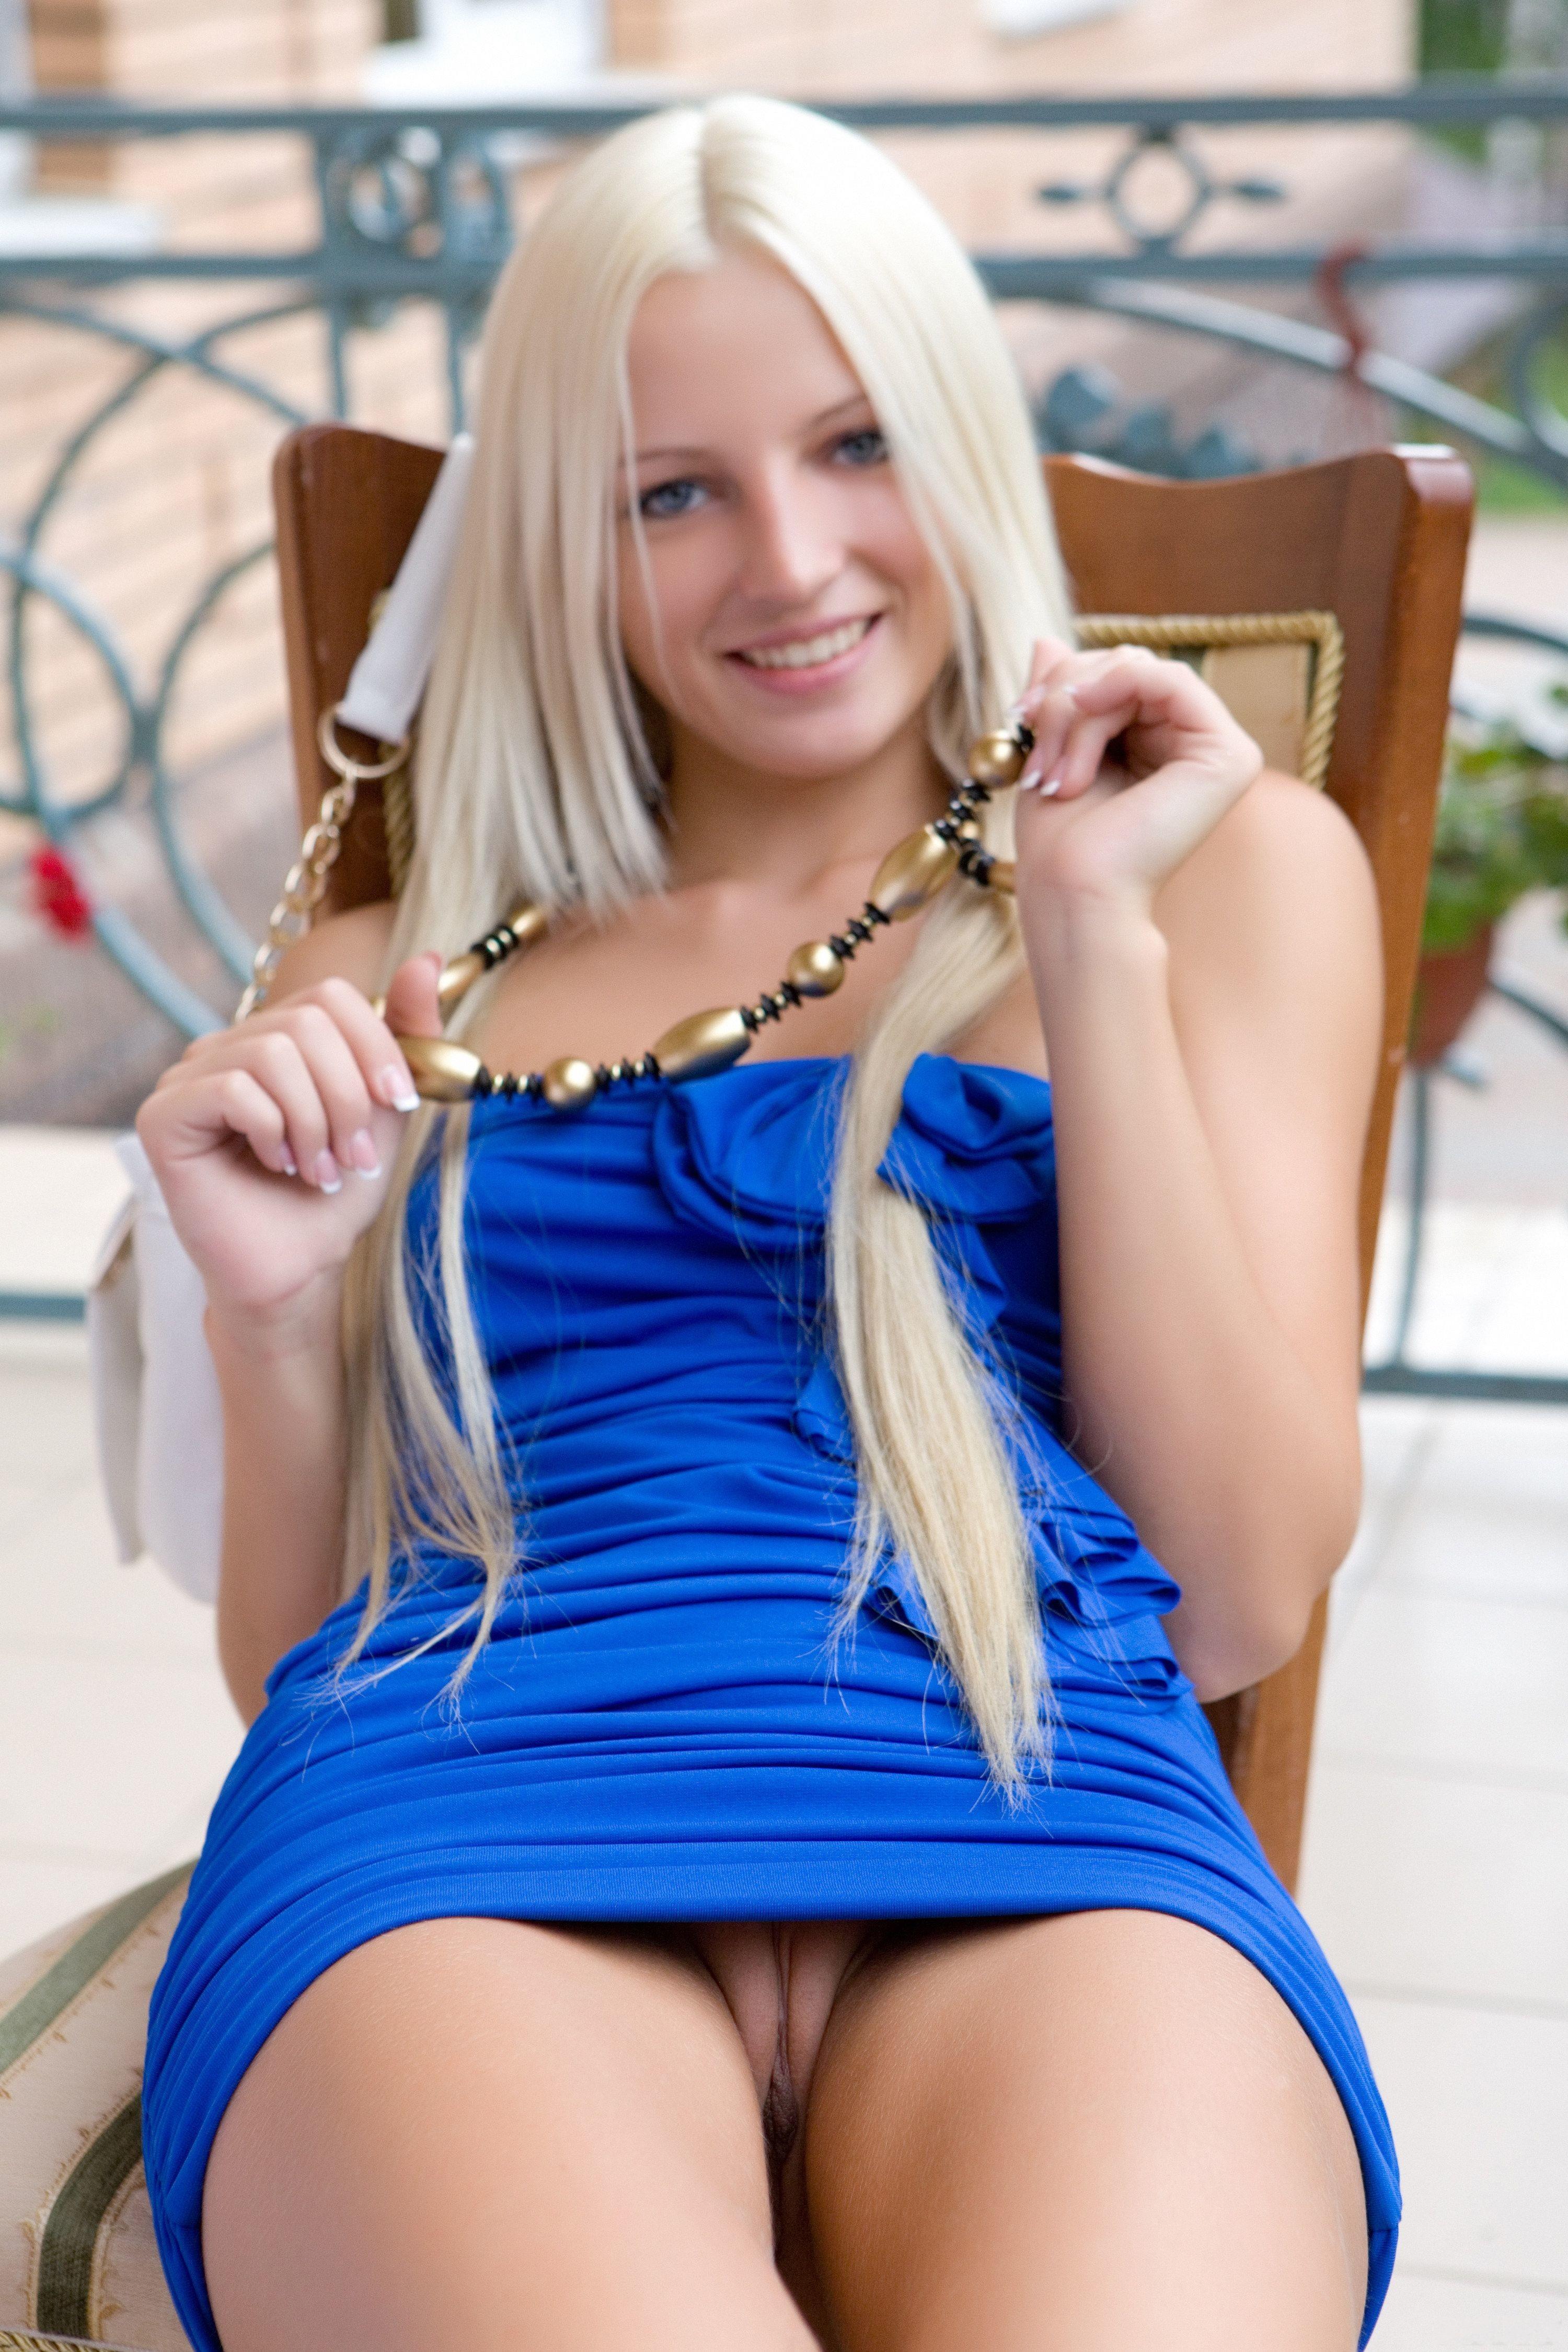 Alysha's Porn alysha a takes off her blue dress. rating = 8.58/10